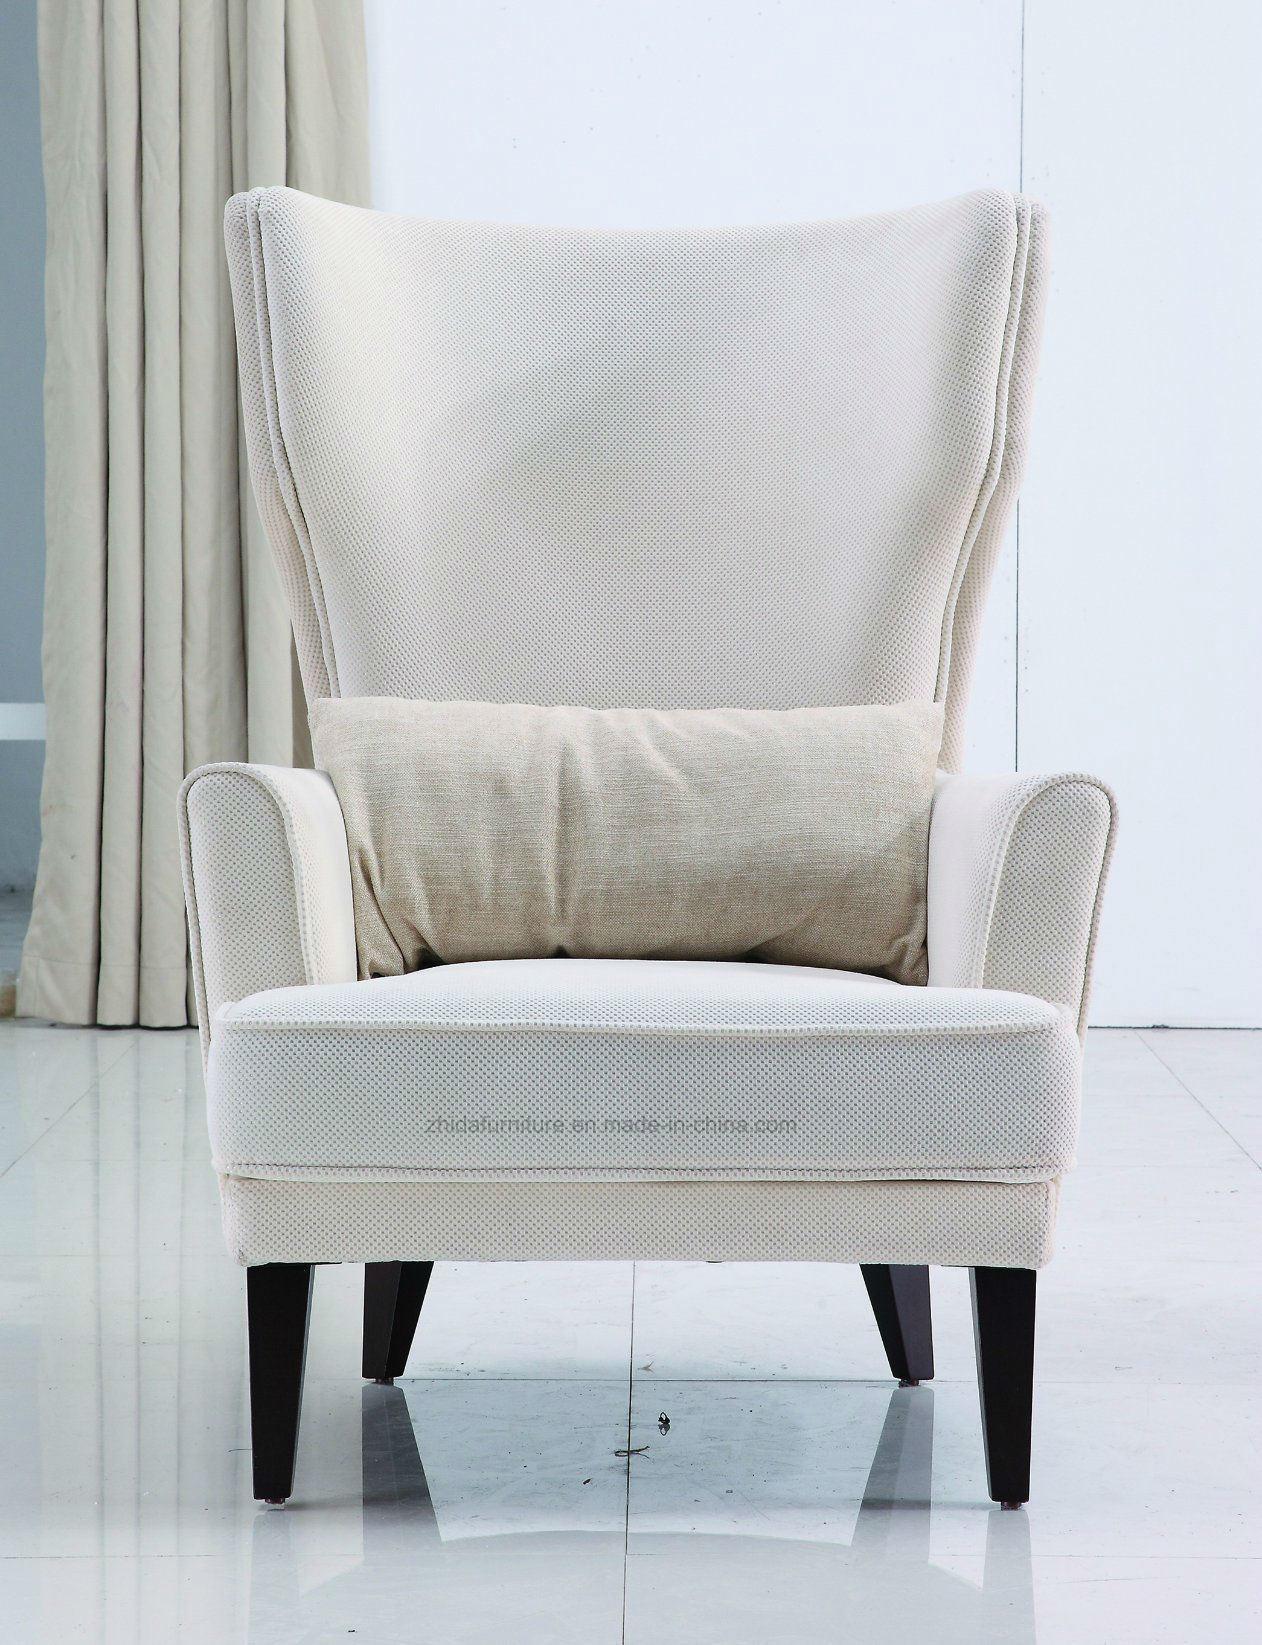 China High Back Arm Chair King Chair Hotel Lobby Chair China Sofa Chair Livingroom Furniture